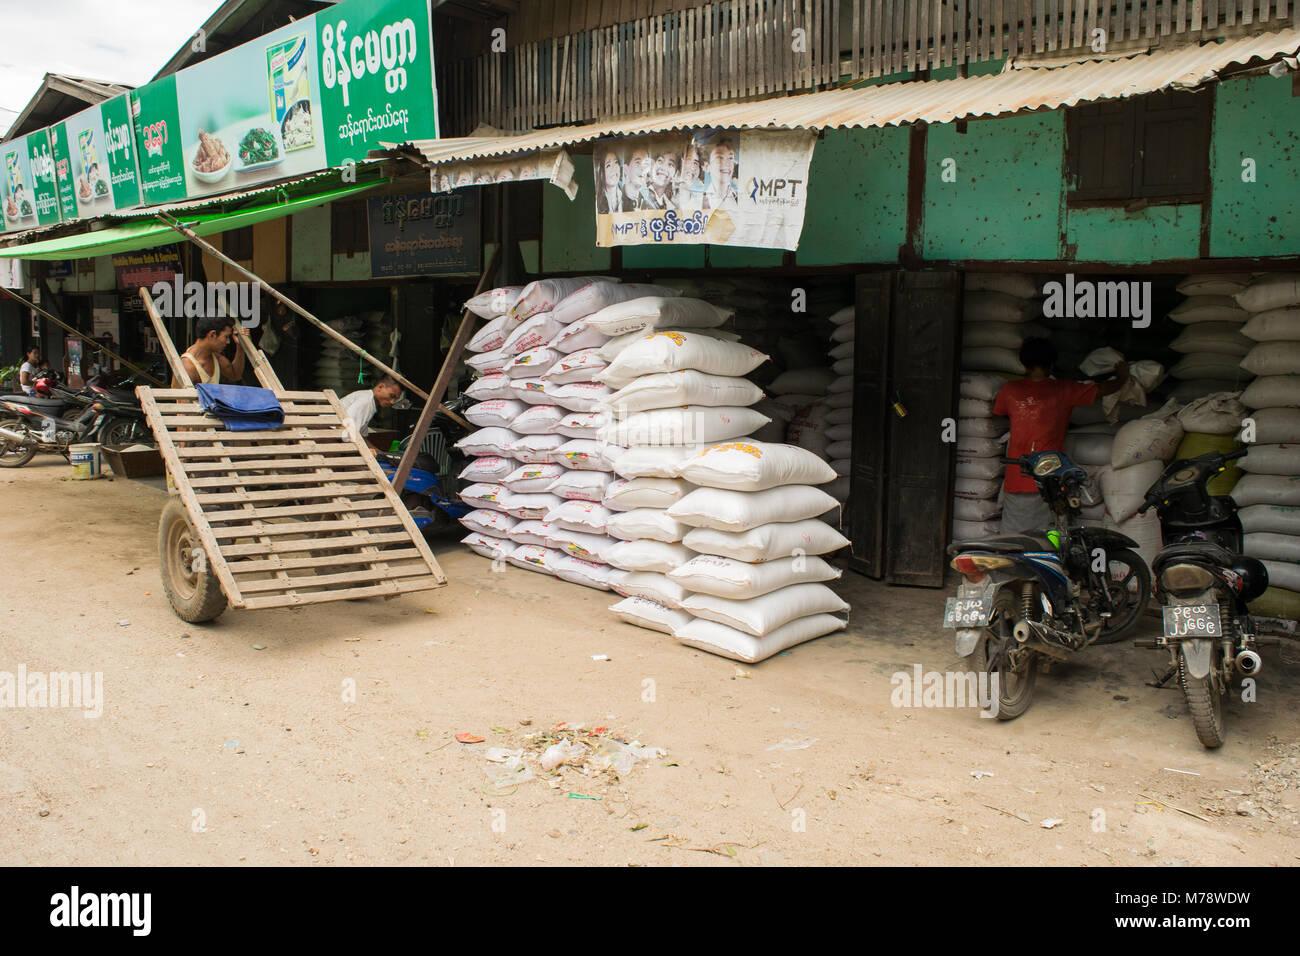 A vendor at Nyaung U market selling sacks of rice or flour. Burmese man with makeshift wooden cart with car tires - Stock Image